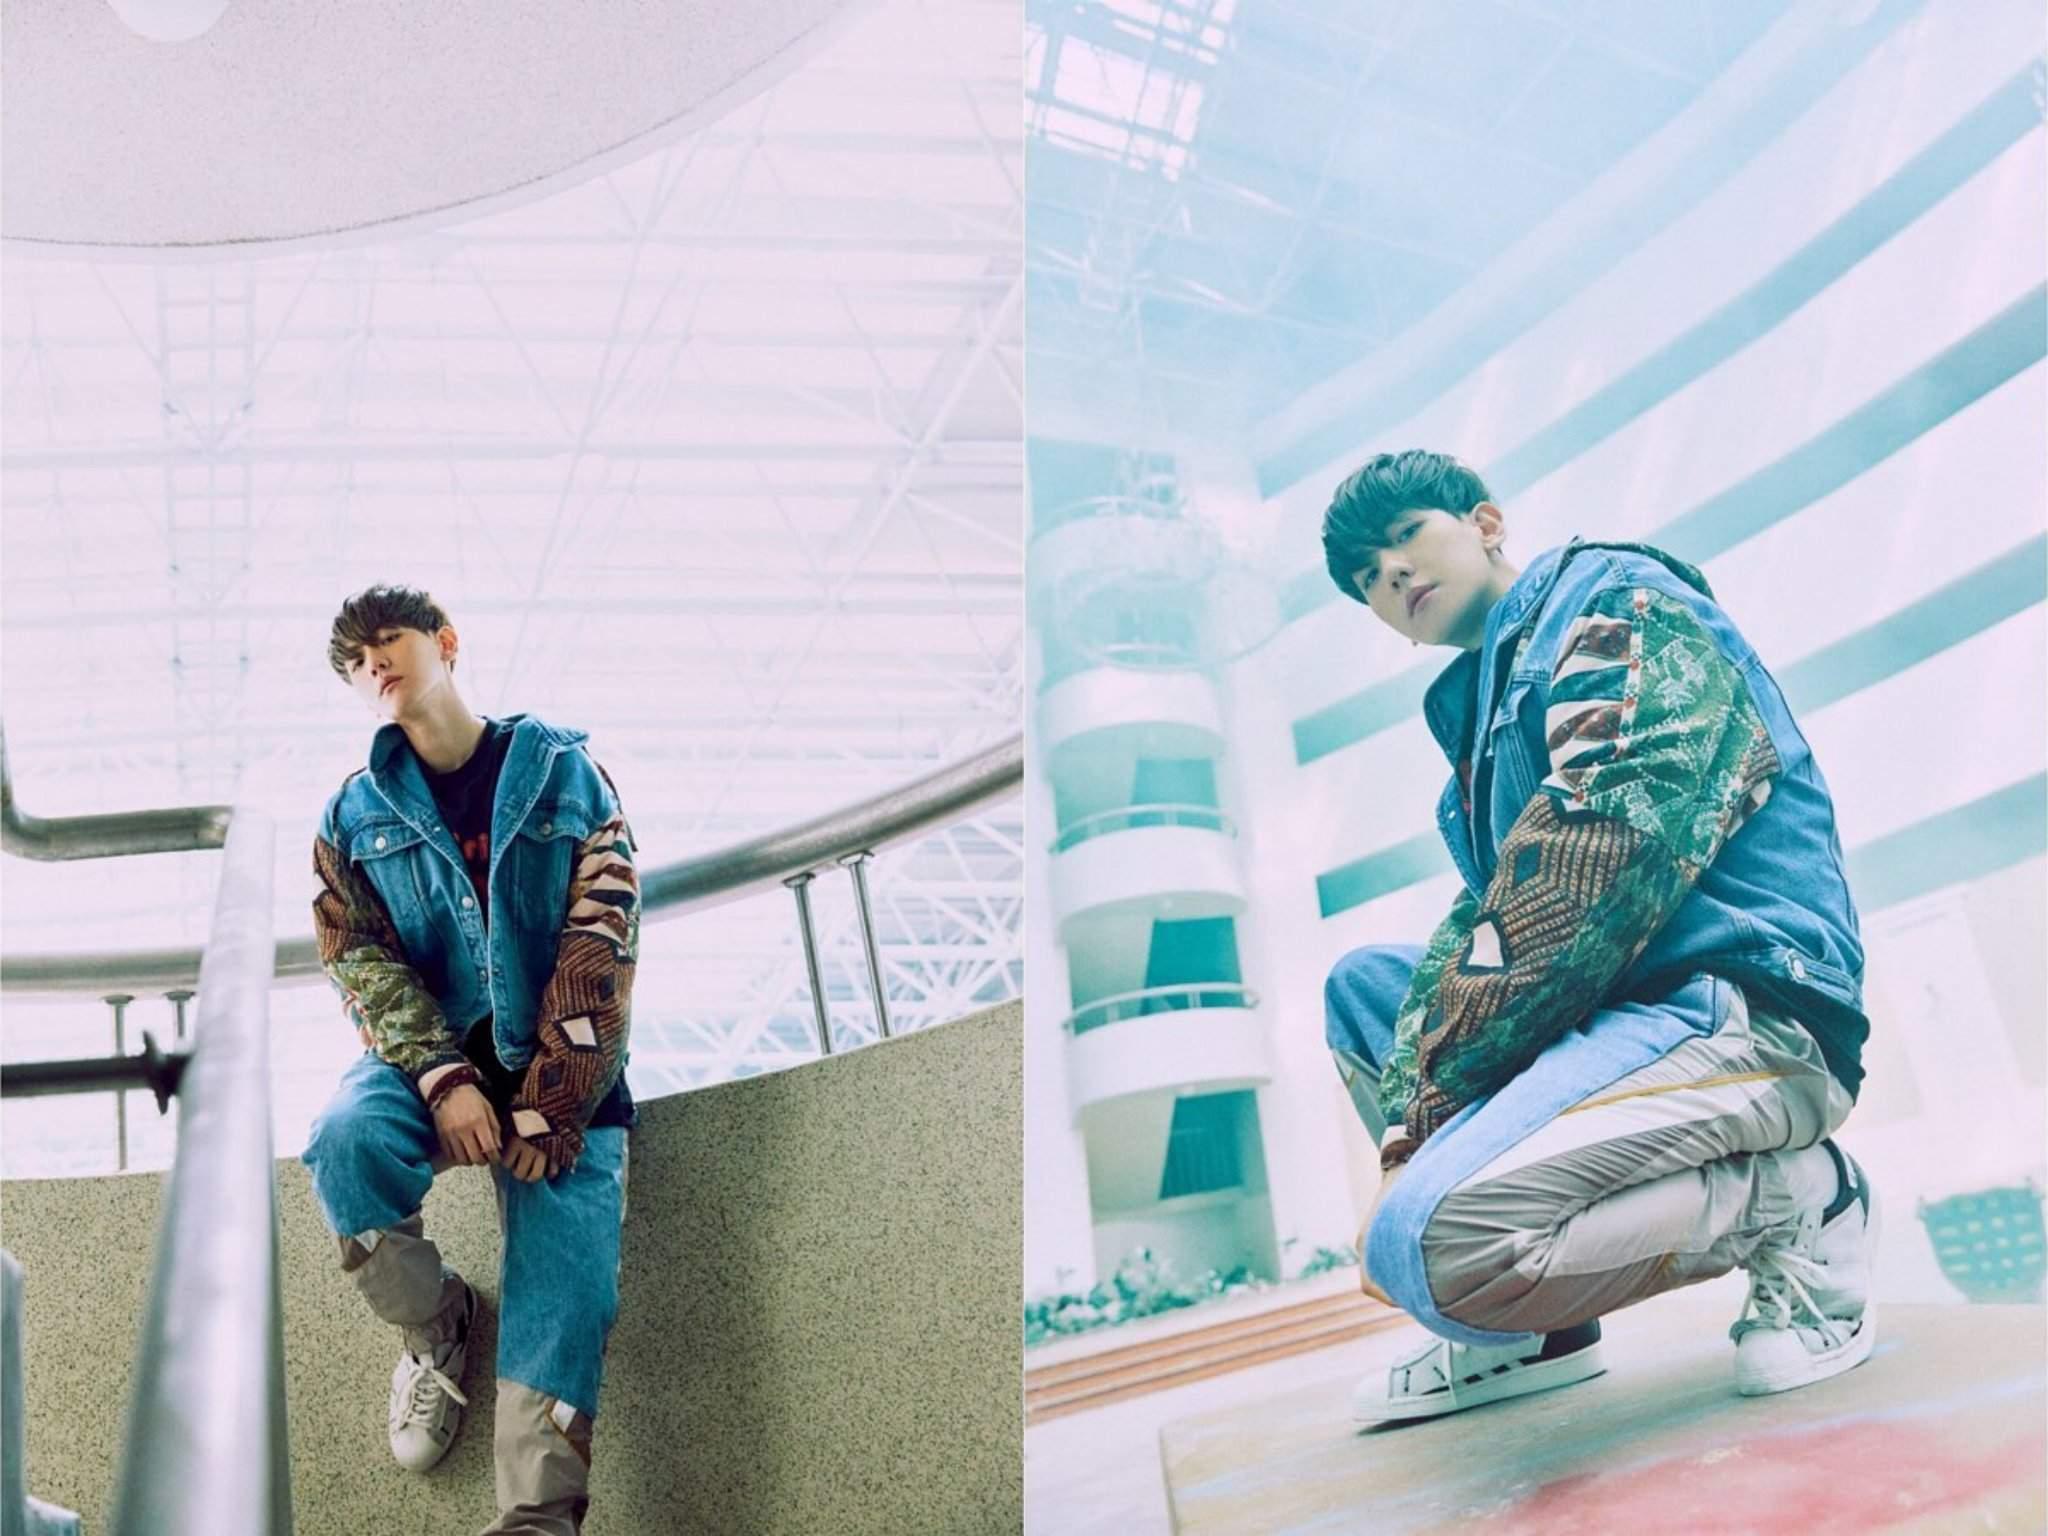 Exo Official S Instagram Post 백현 Baekhyun The 2nd Mini